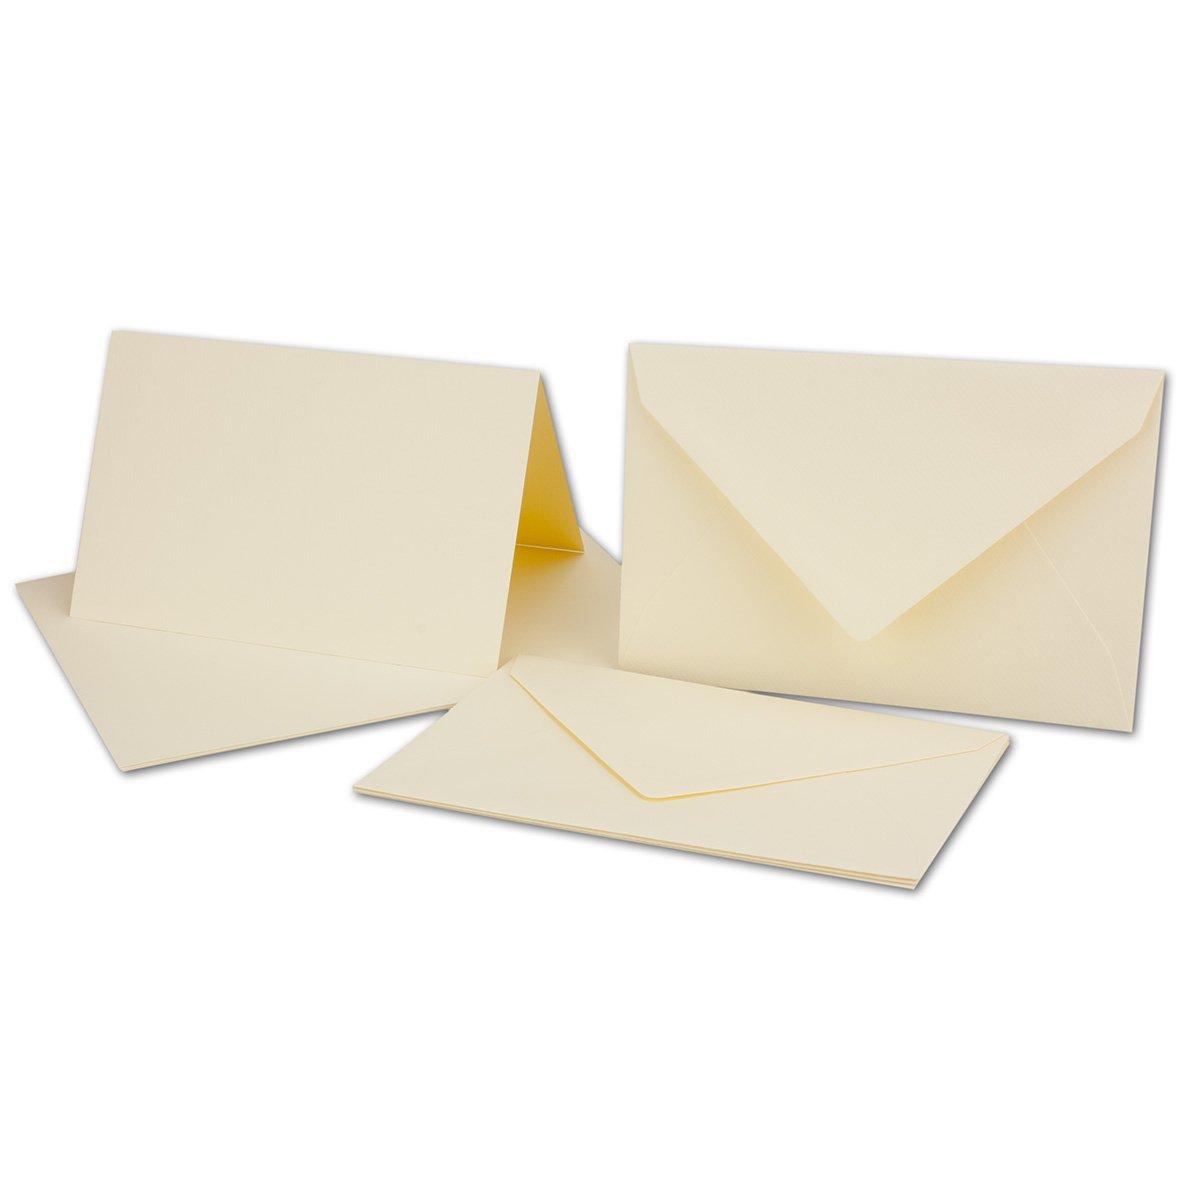 Tarjeta del paquete/plegable Tarjetas/Sobres DIN B6 en en en crema Chamois//acanalados., color Creme-Chamois 100 Sets 75618f